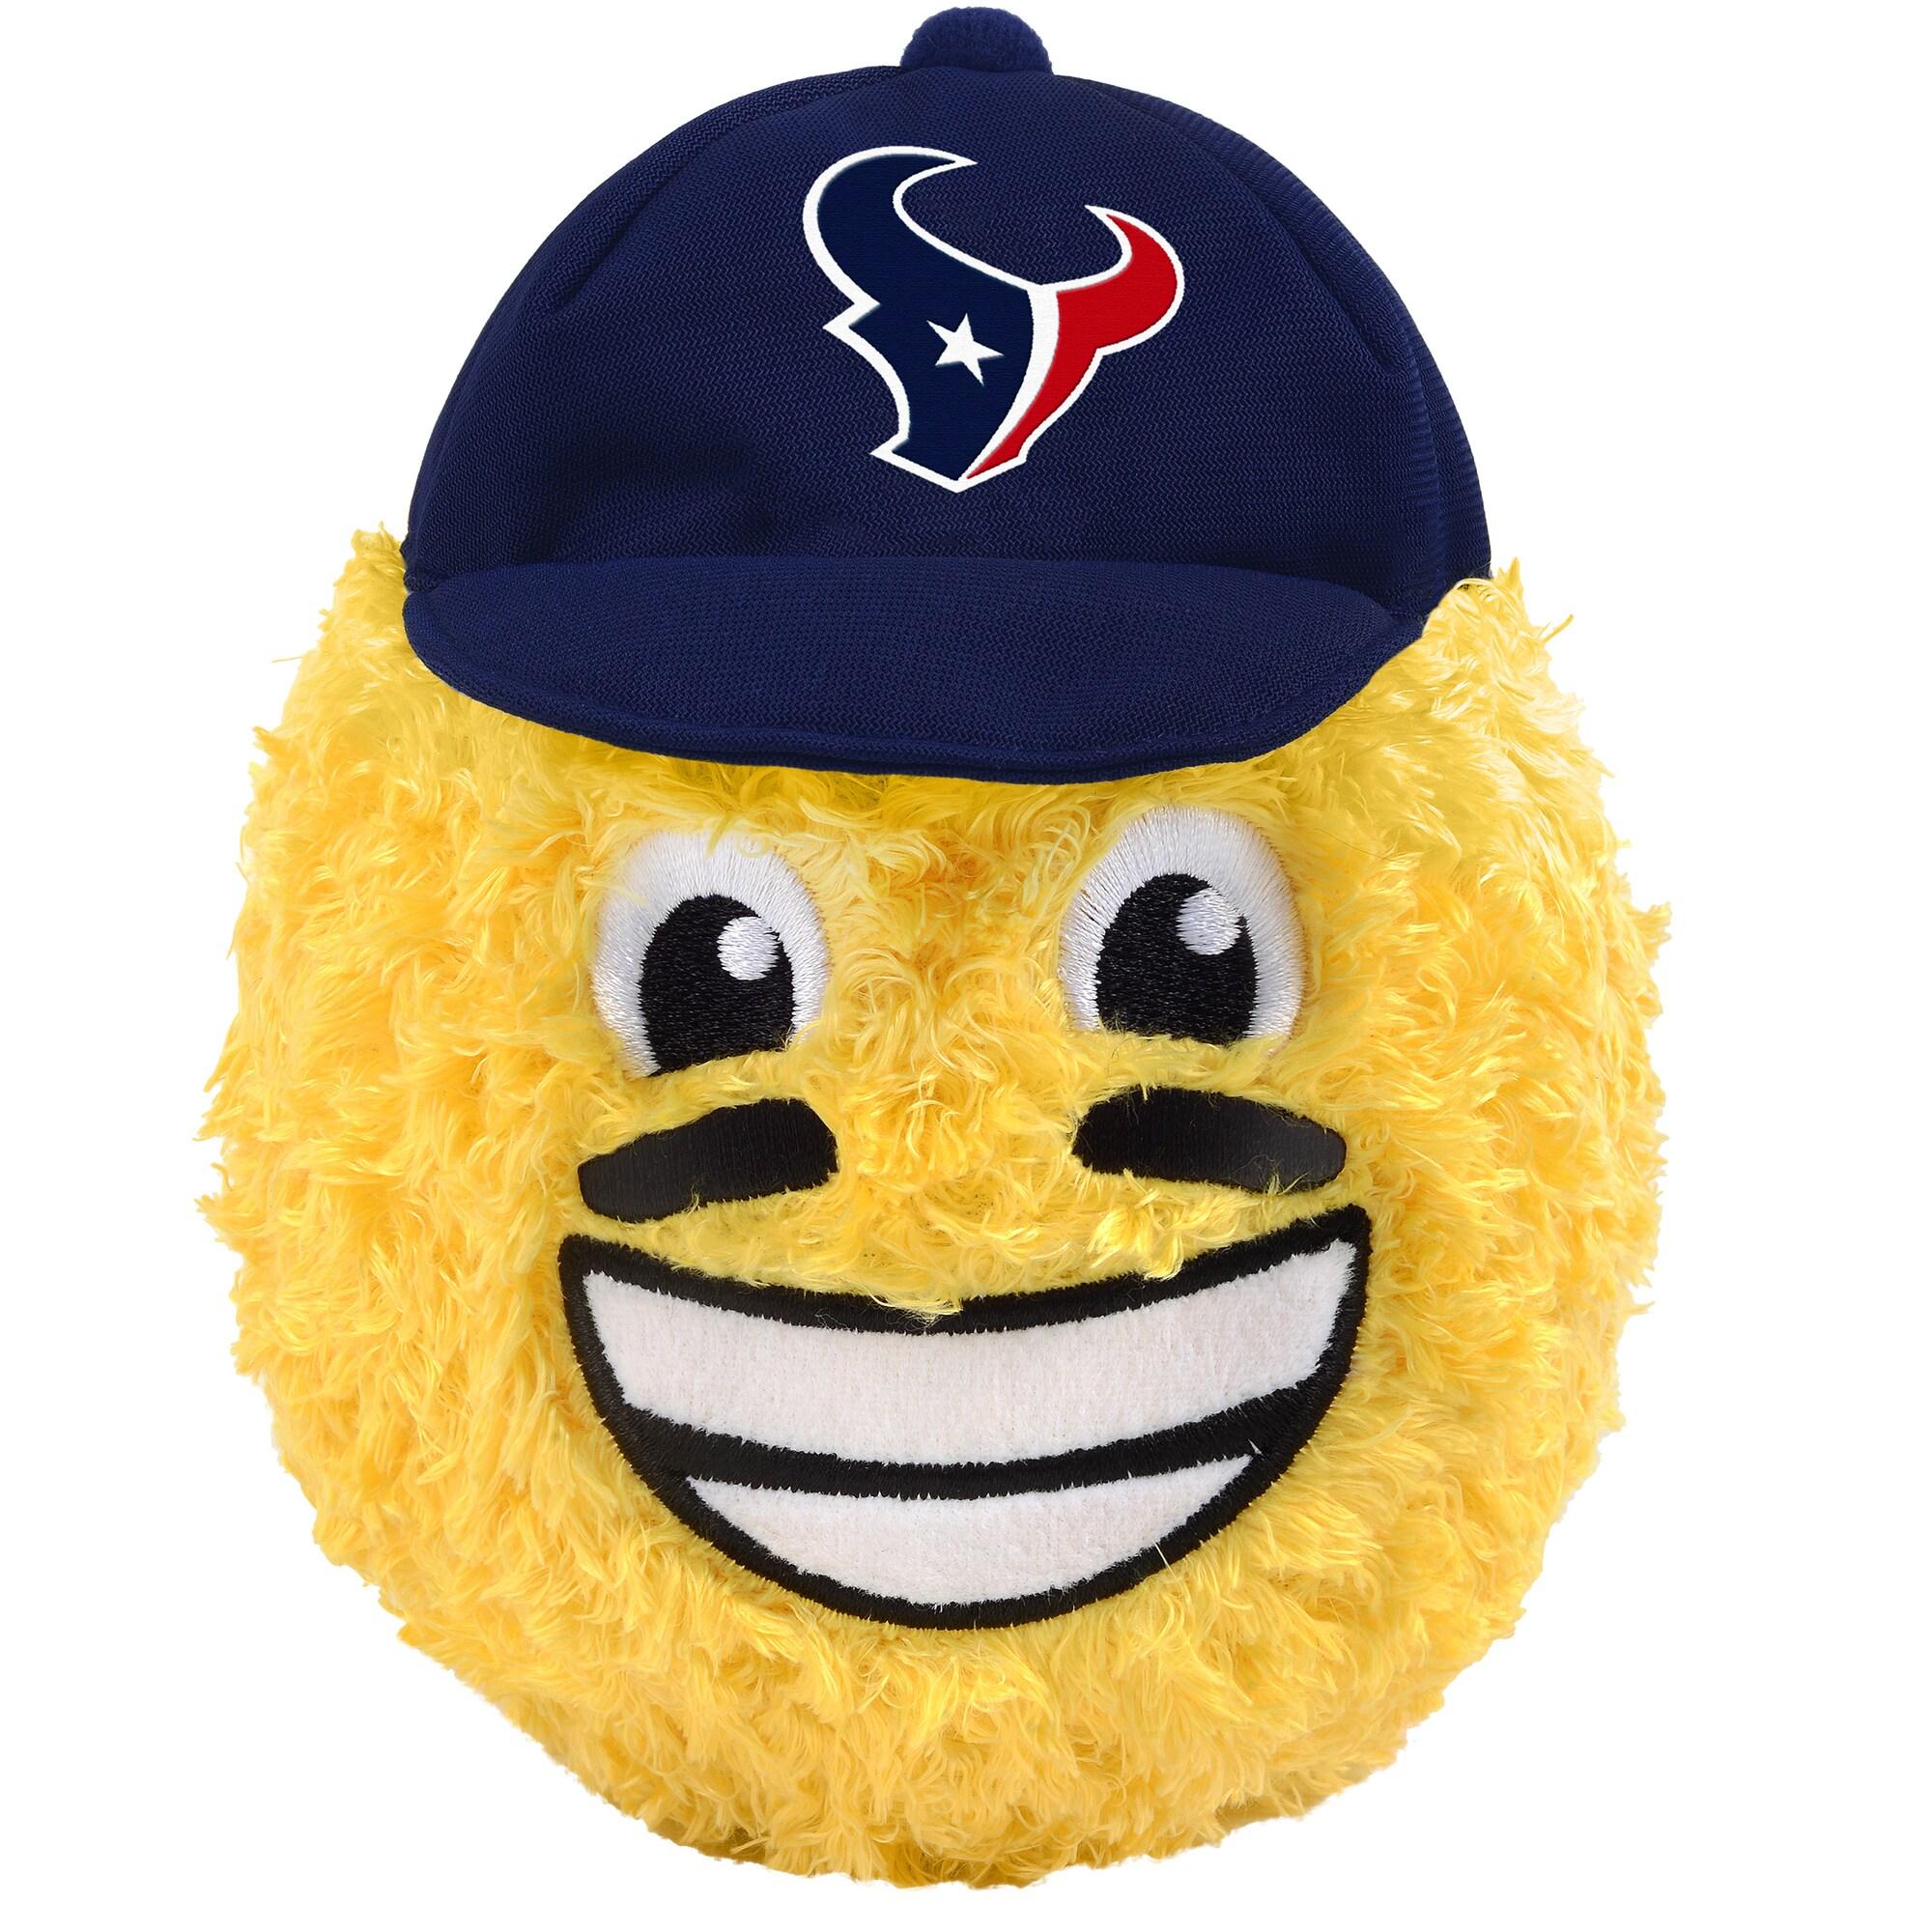 "Houston Texans 5"" Eye Black Teamoji Plush Toy"